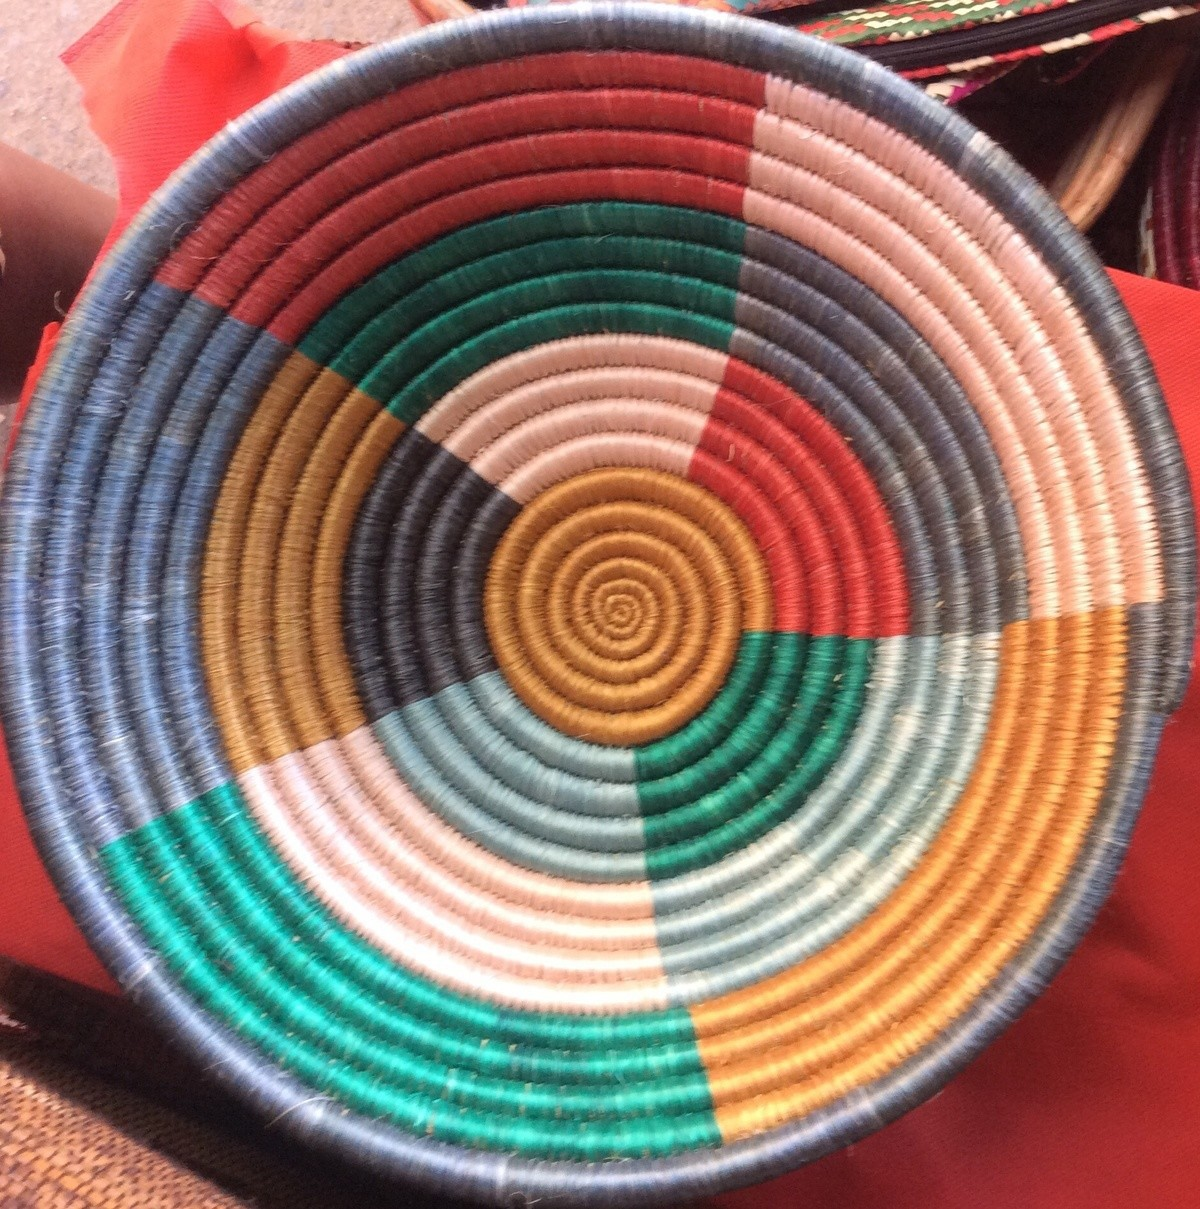 Tenture Africaine Grande Taille petit panier du rwanda, panier africain suspendu, corbeilles de fruits